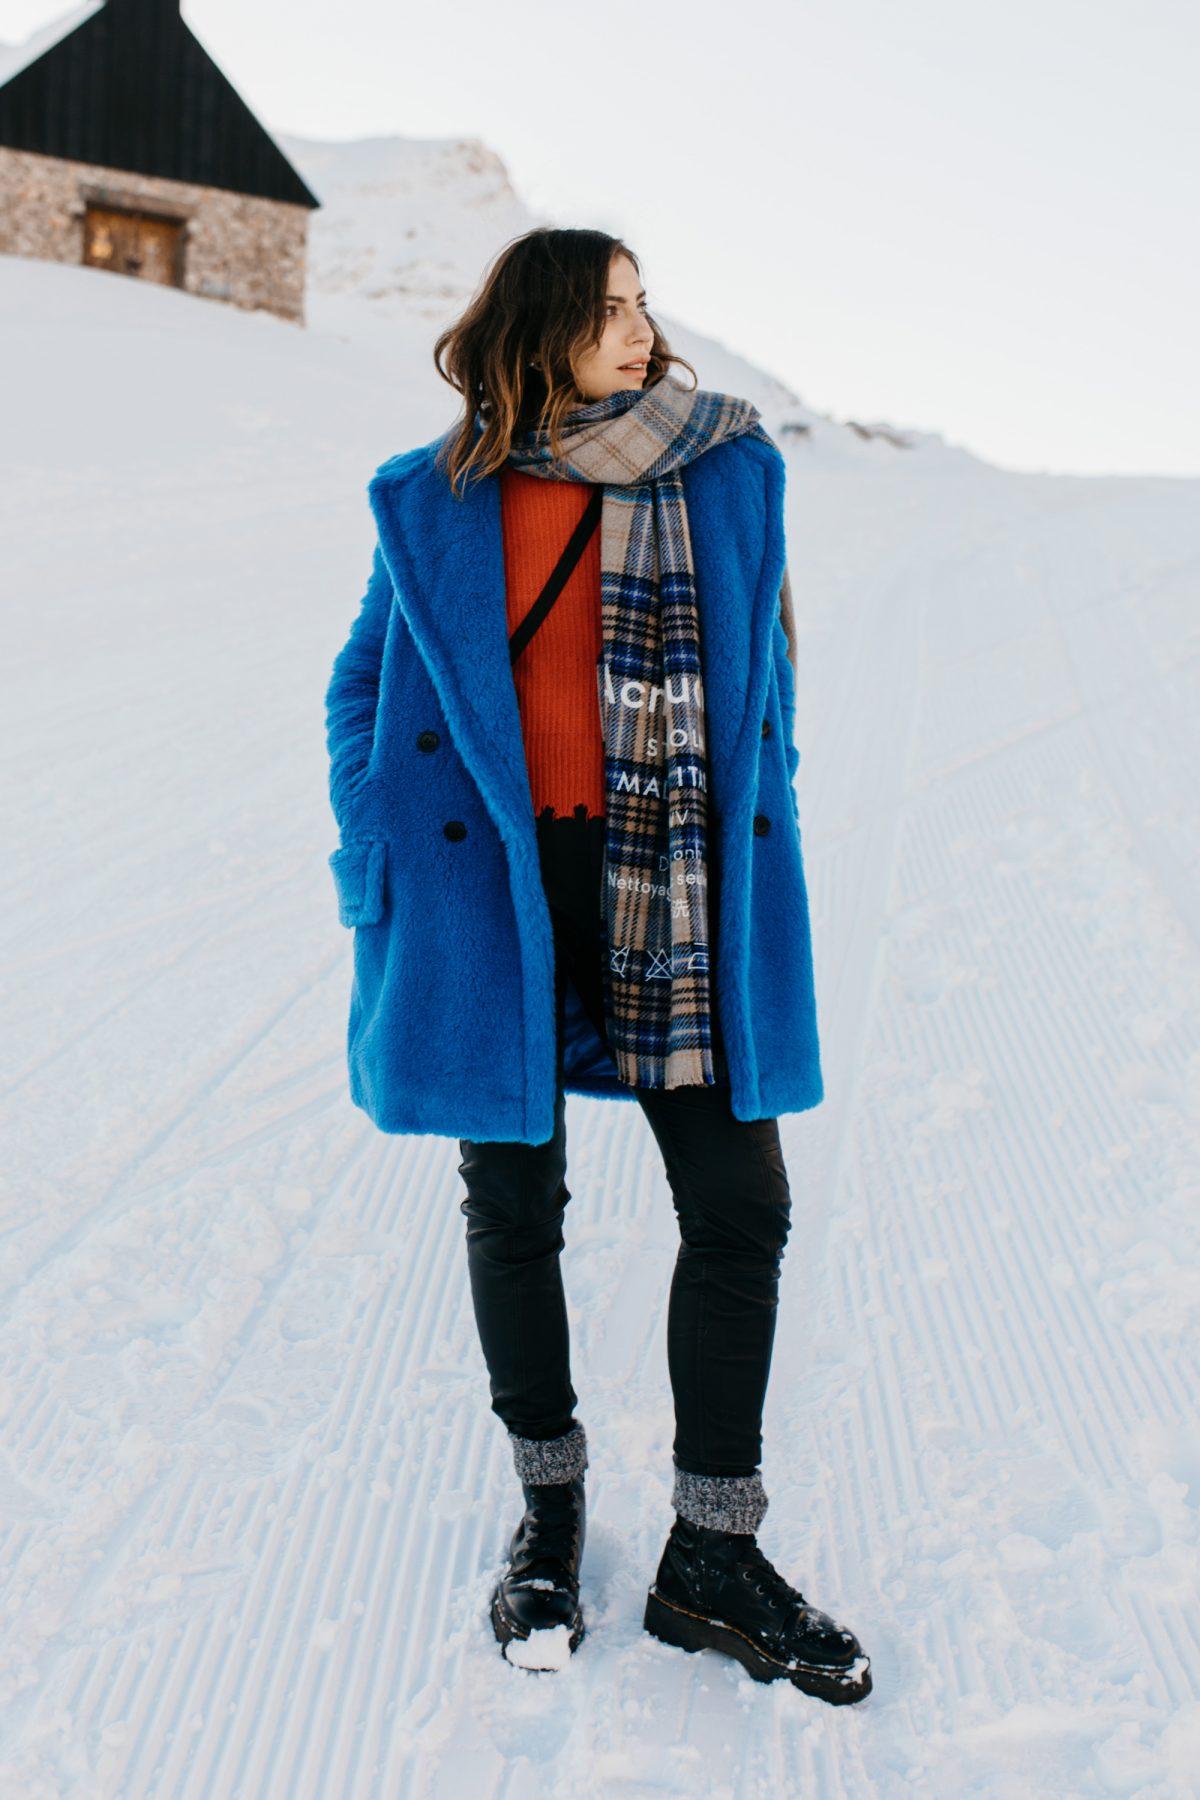 The Blue Teddy Coat